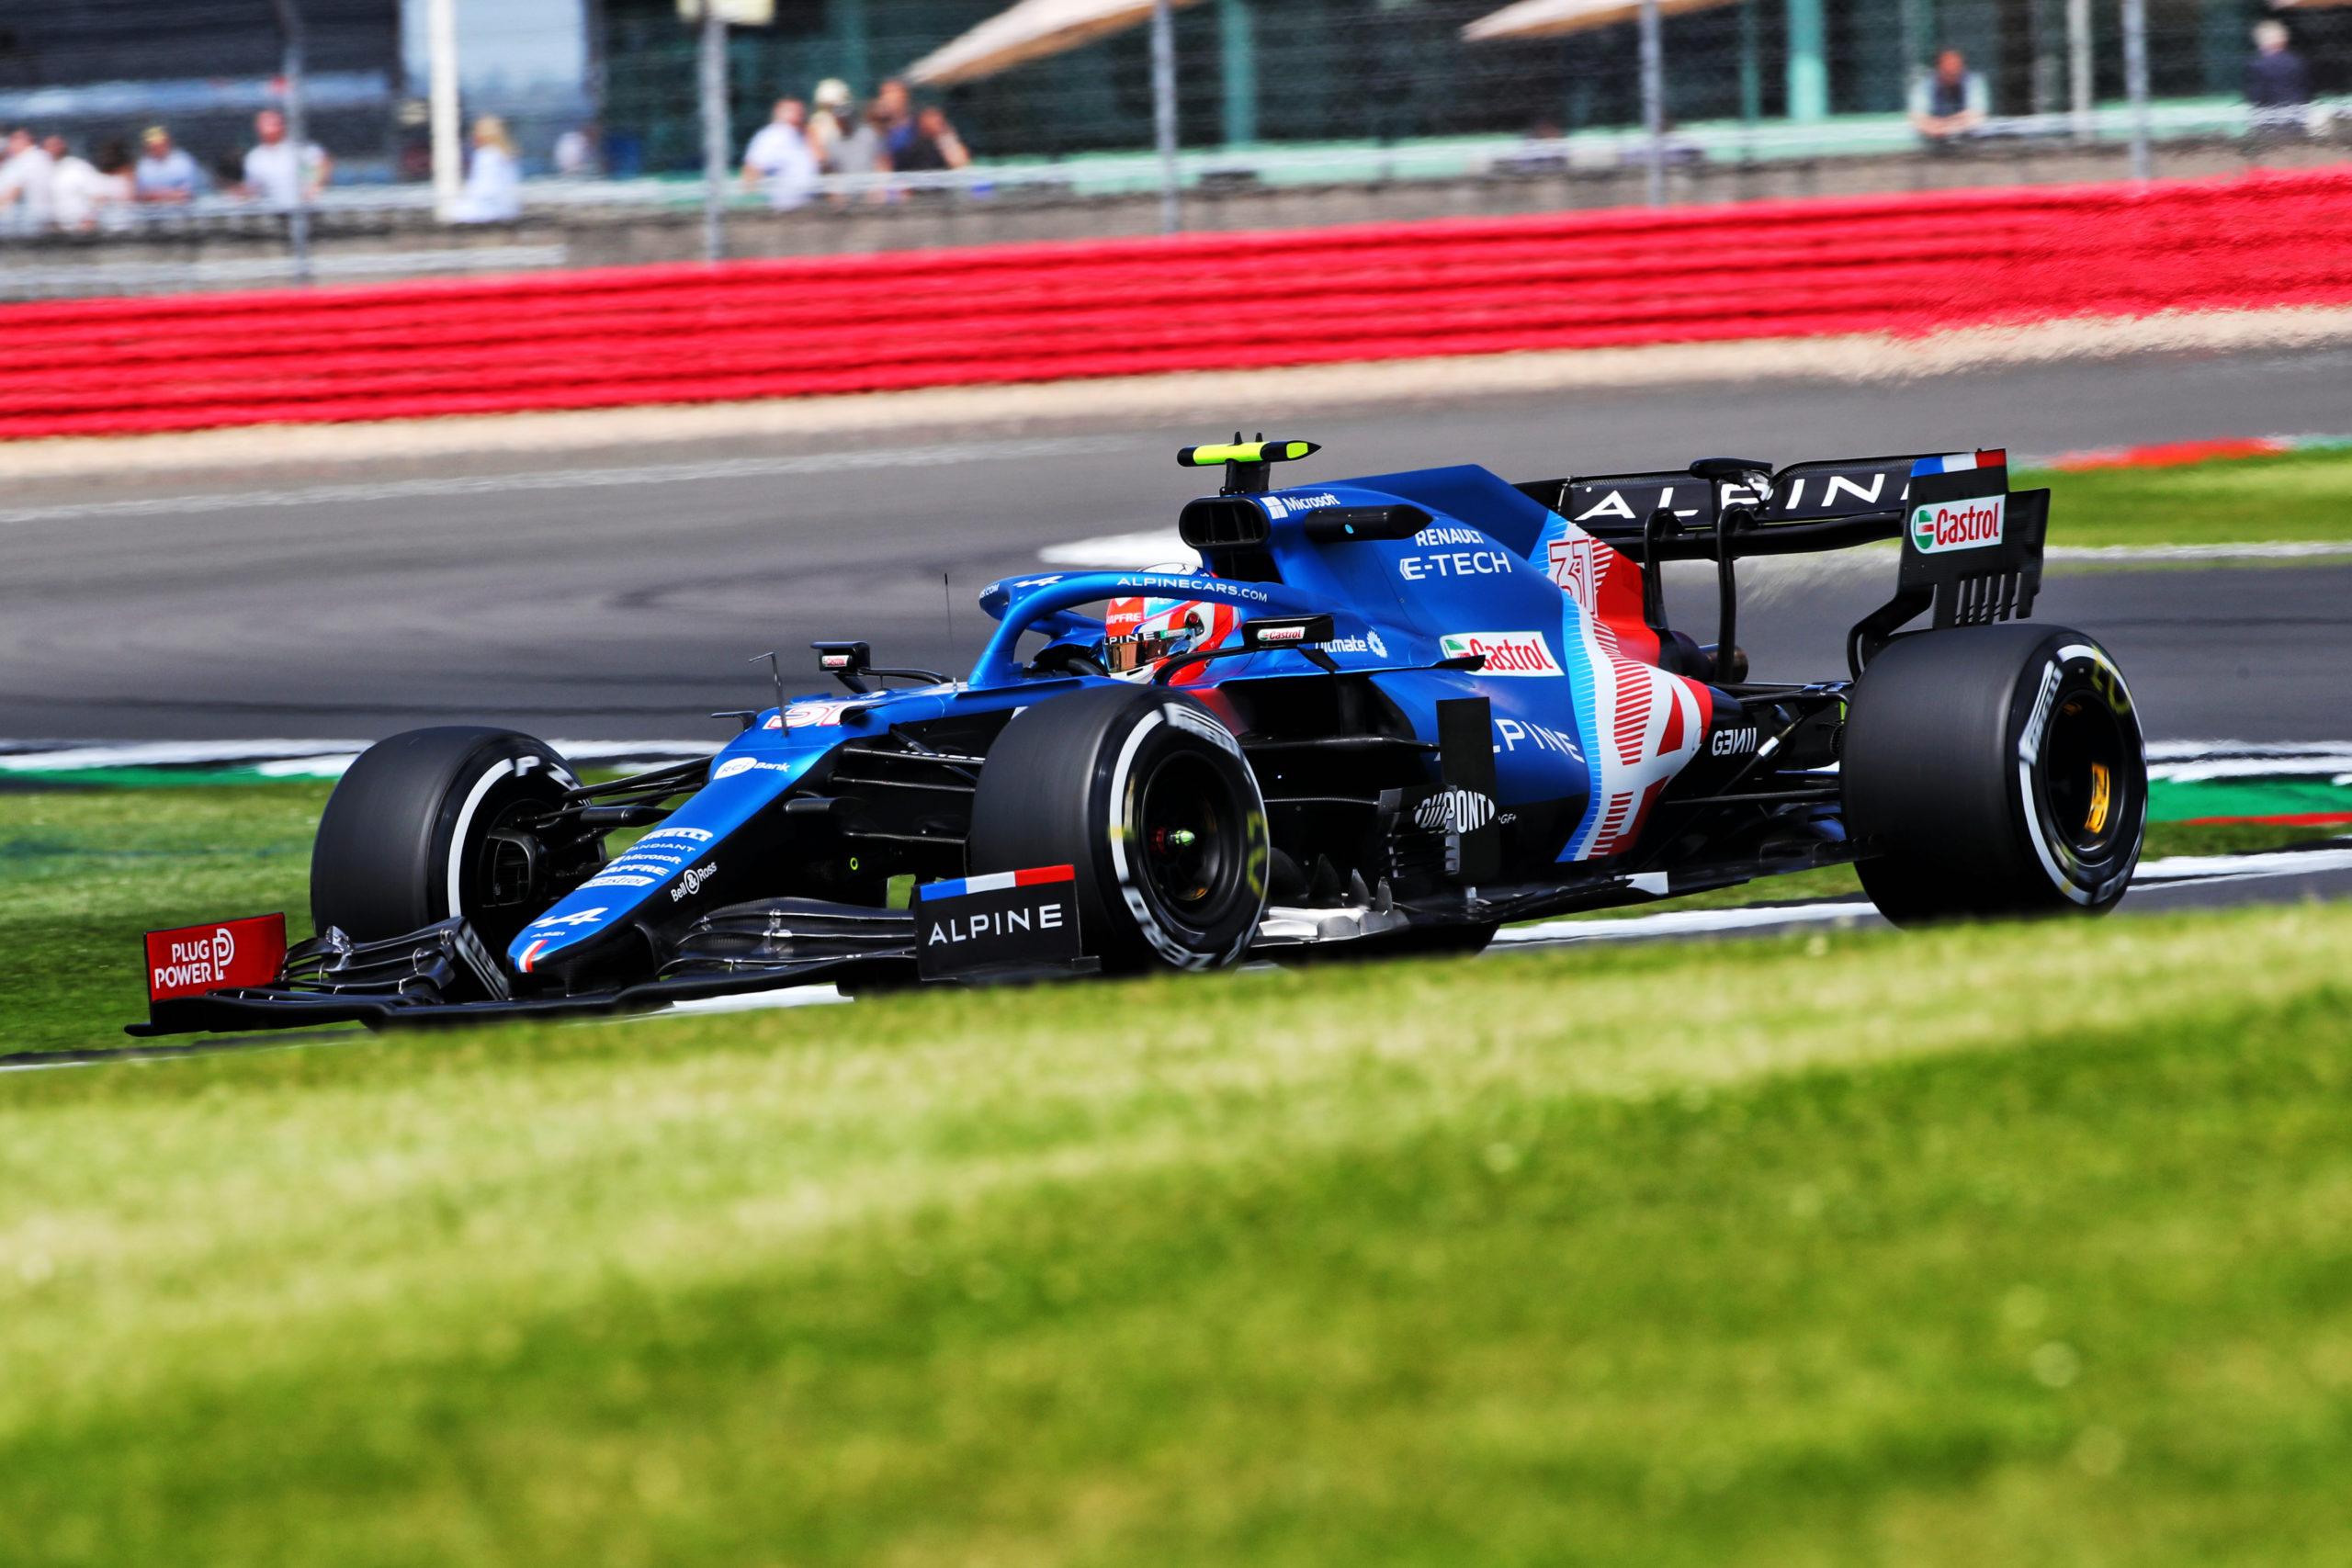 NORTHAMPTON, ENGLAND - JULY 16: Esteban Ocon of Spain. Alpine F1 Team, British GP 2021.